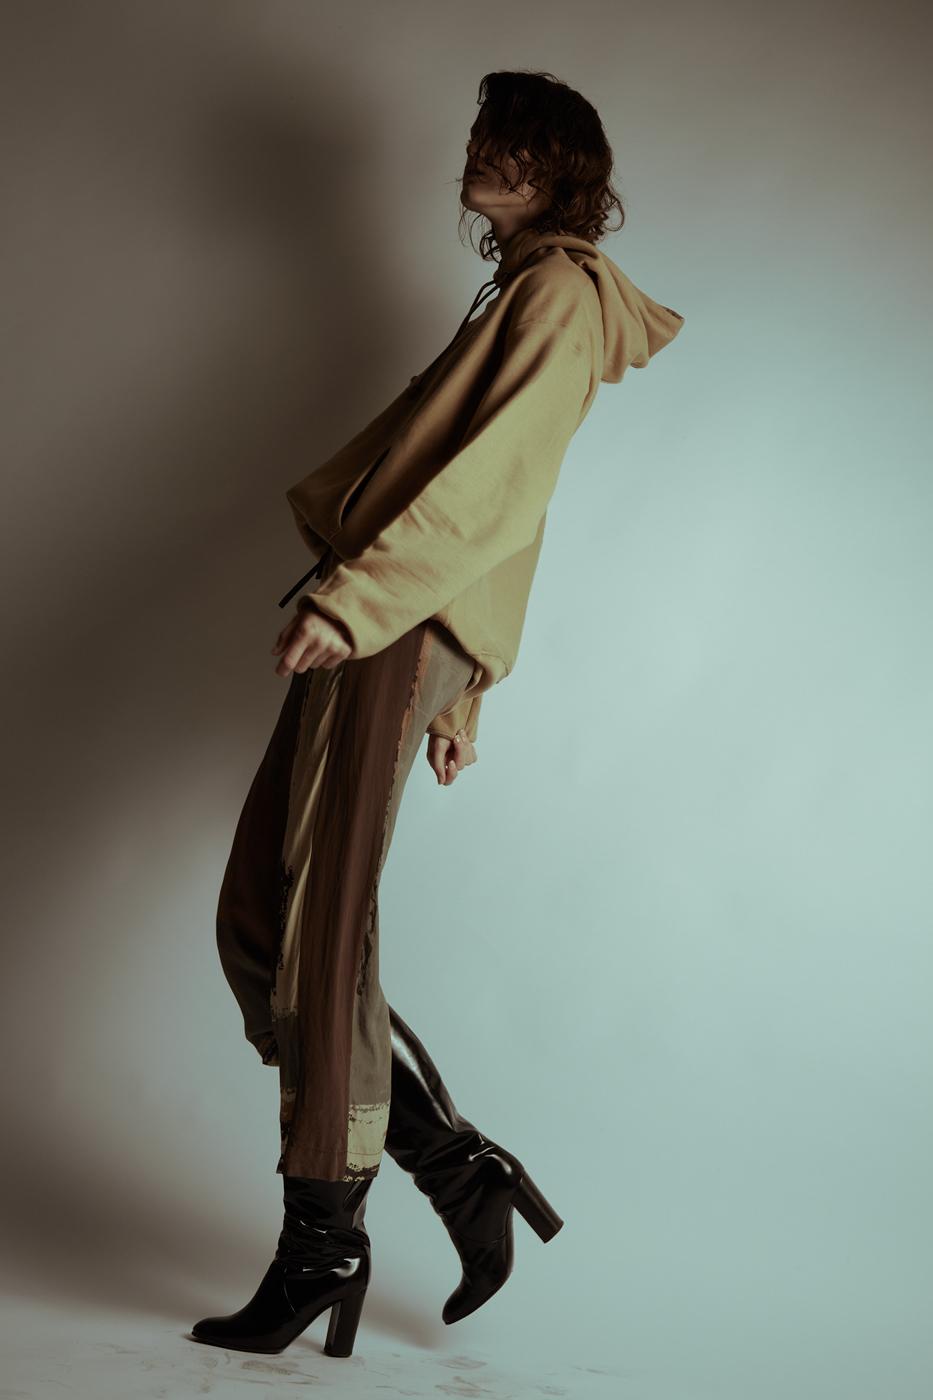 Sweatshirt: Champion; Trousers: Atelier Pichita; Boots: Max Mara